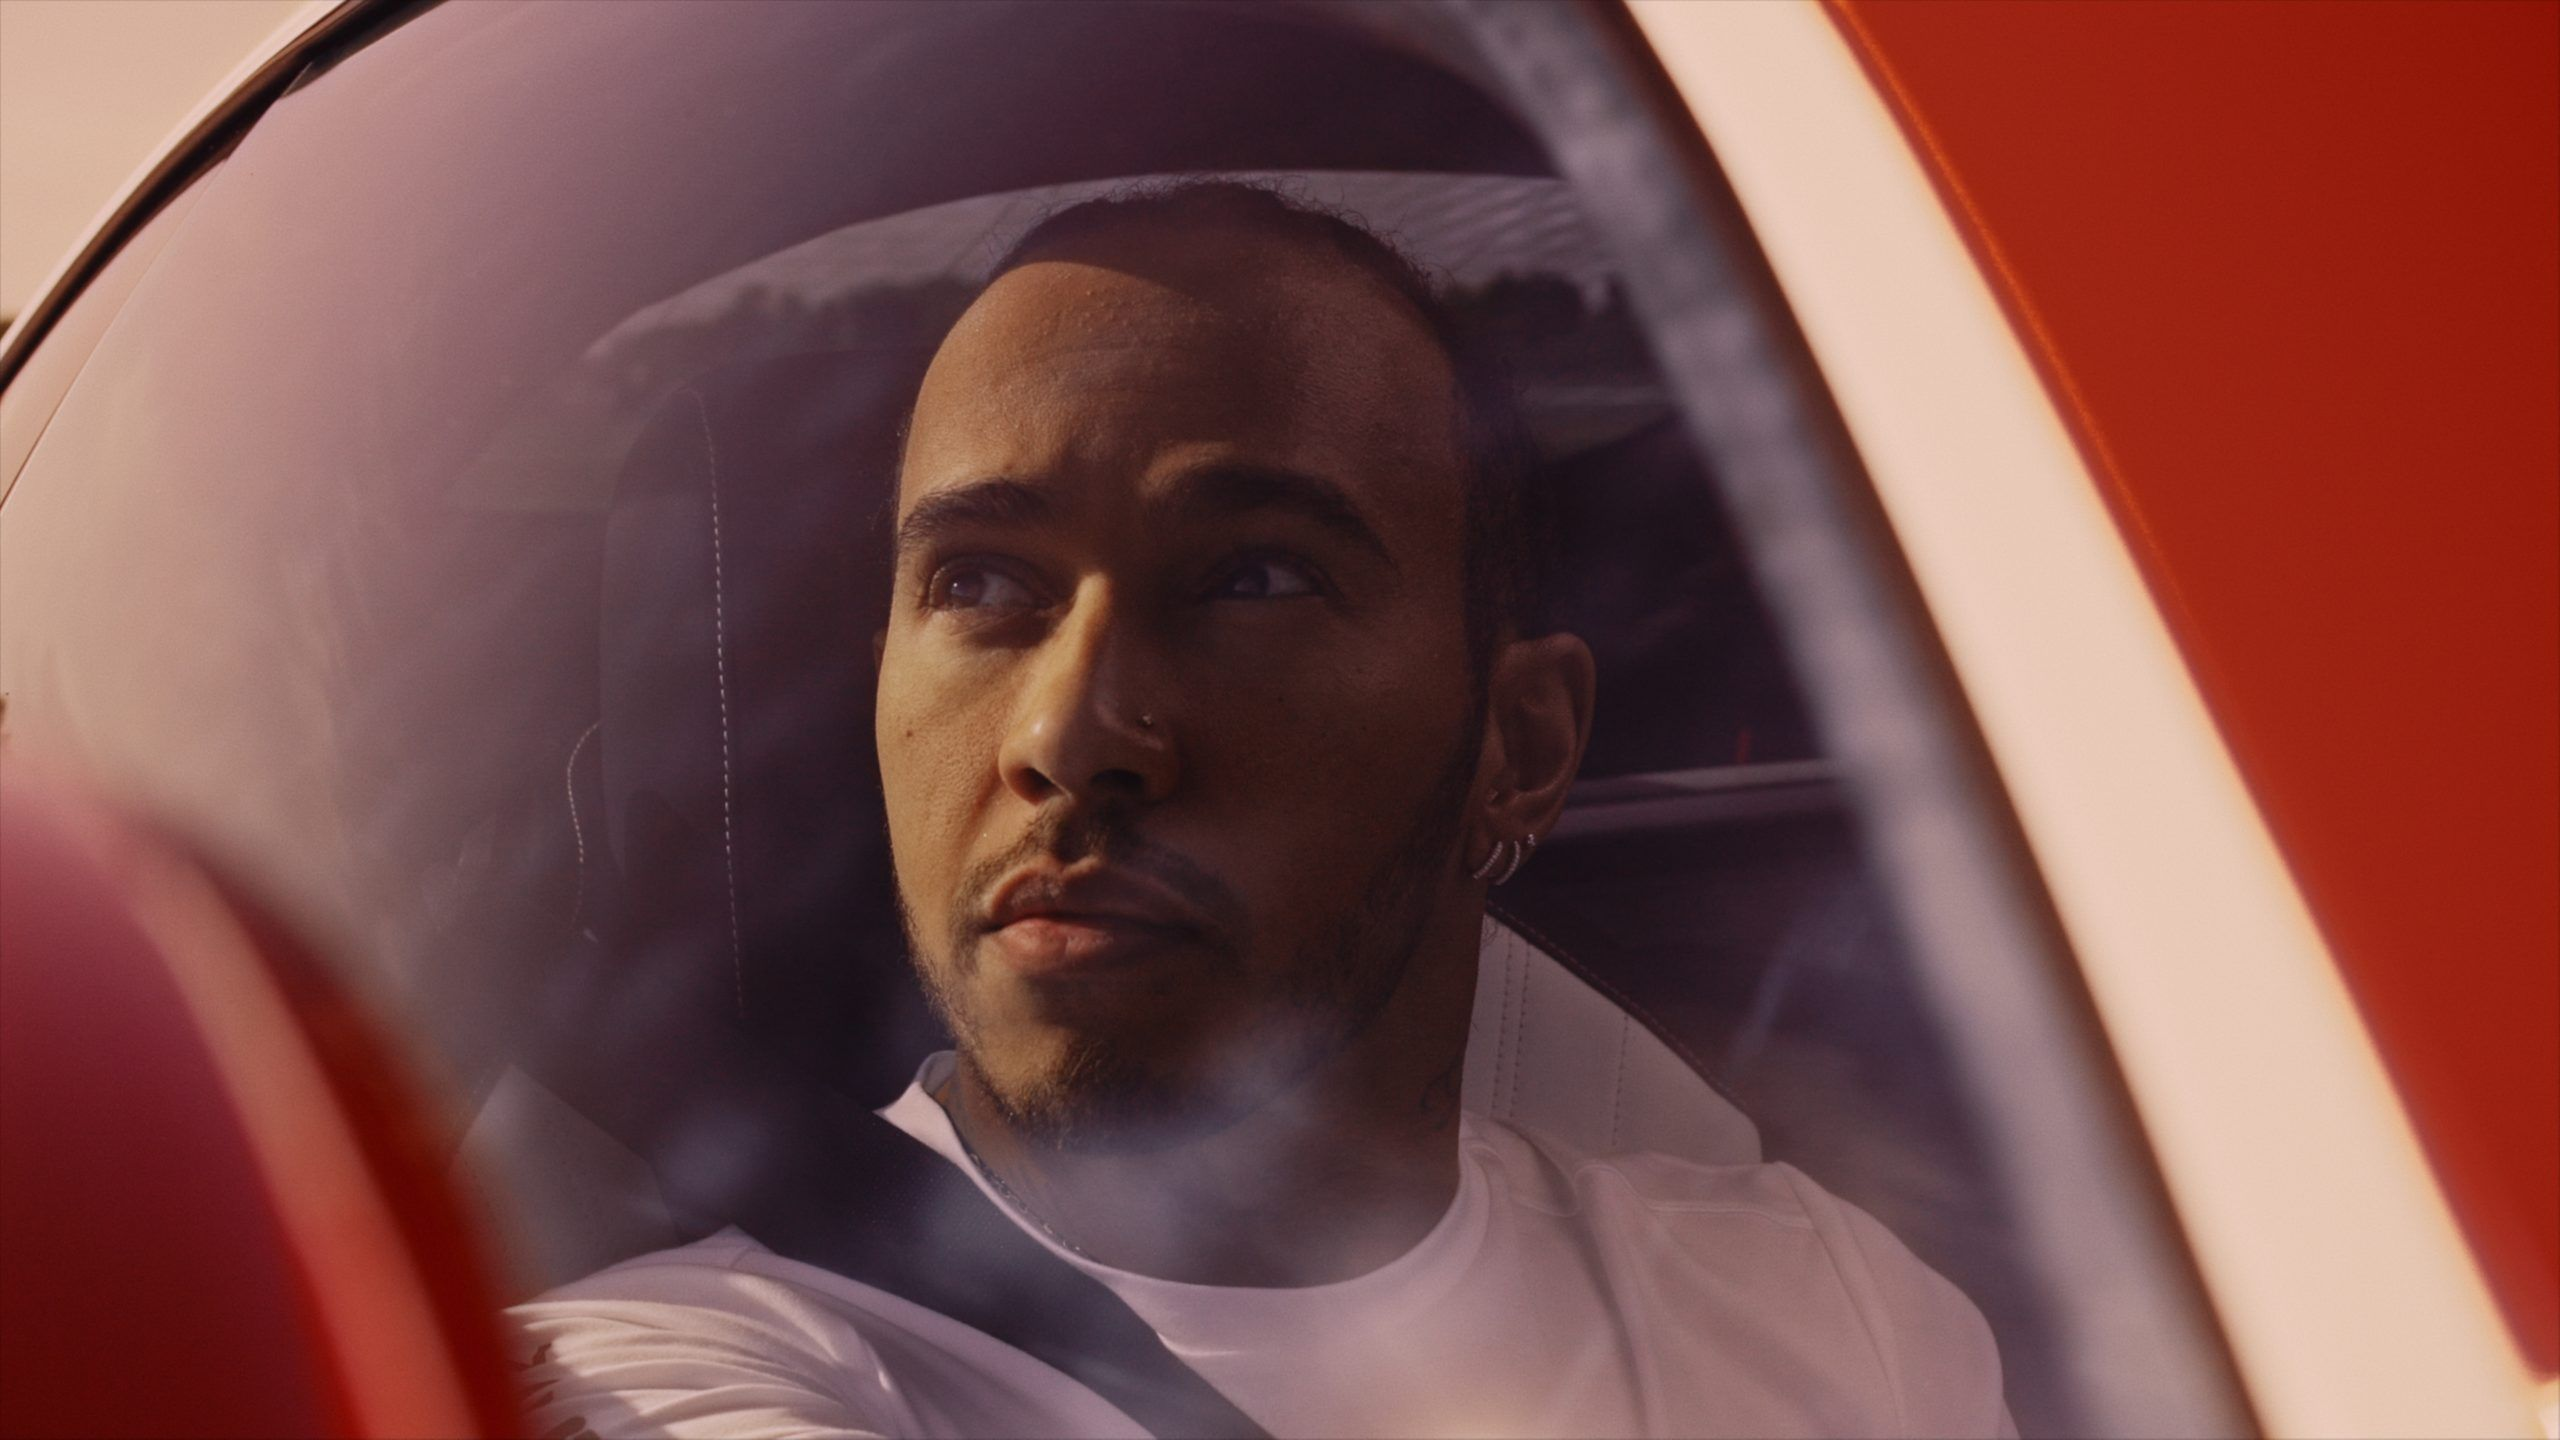 CrowdStrike x Lewis Hamilton